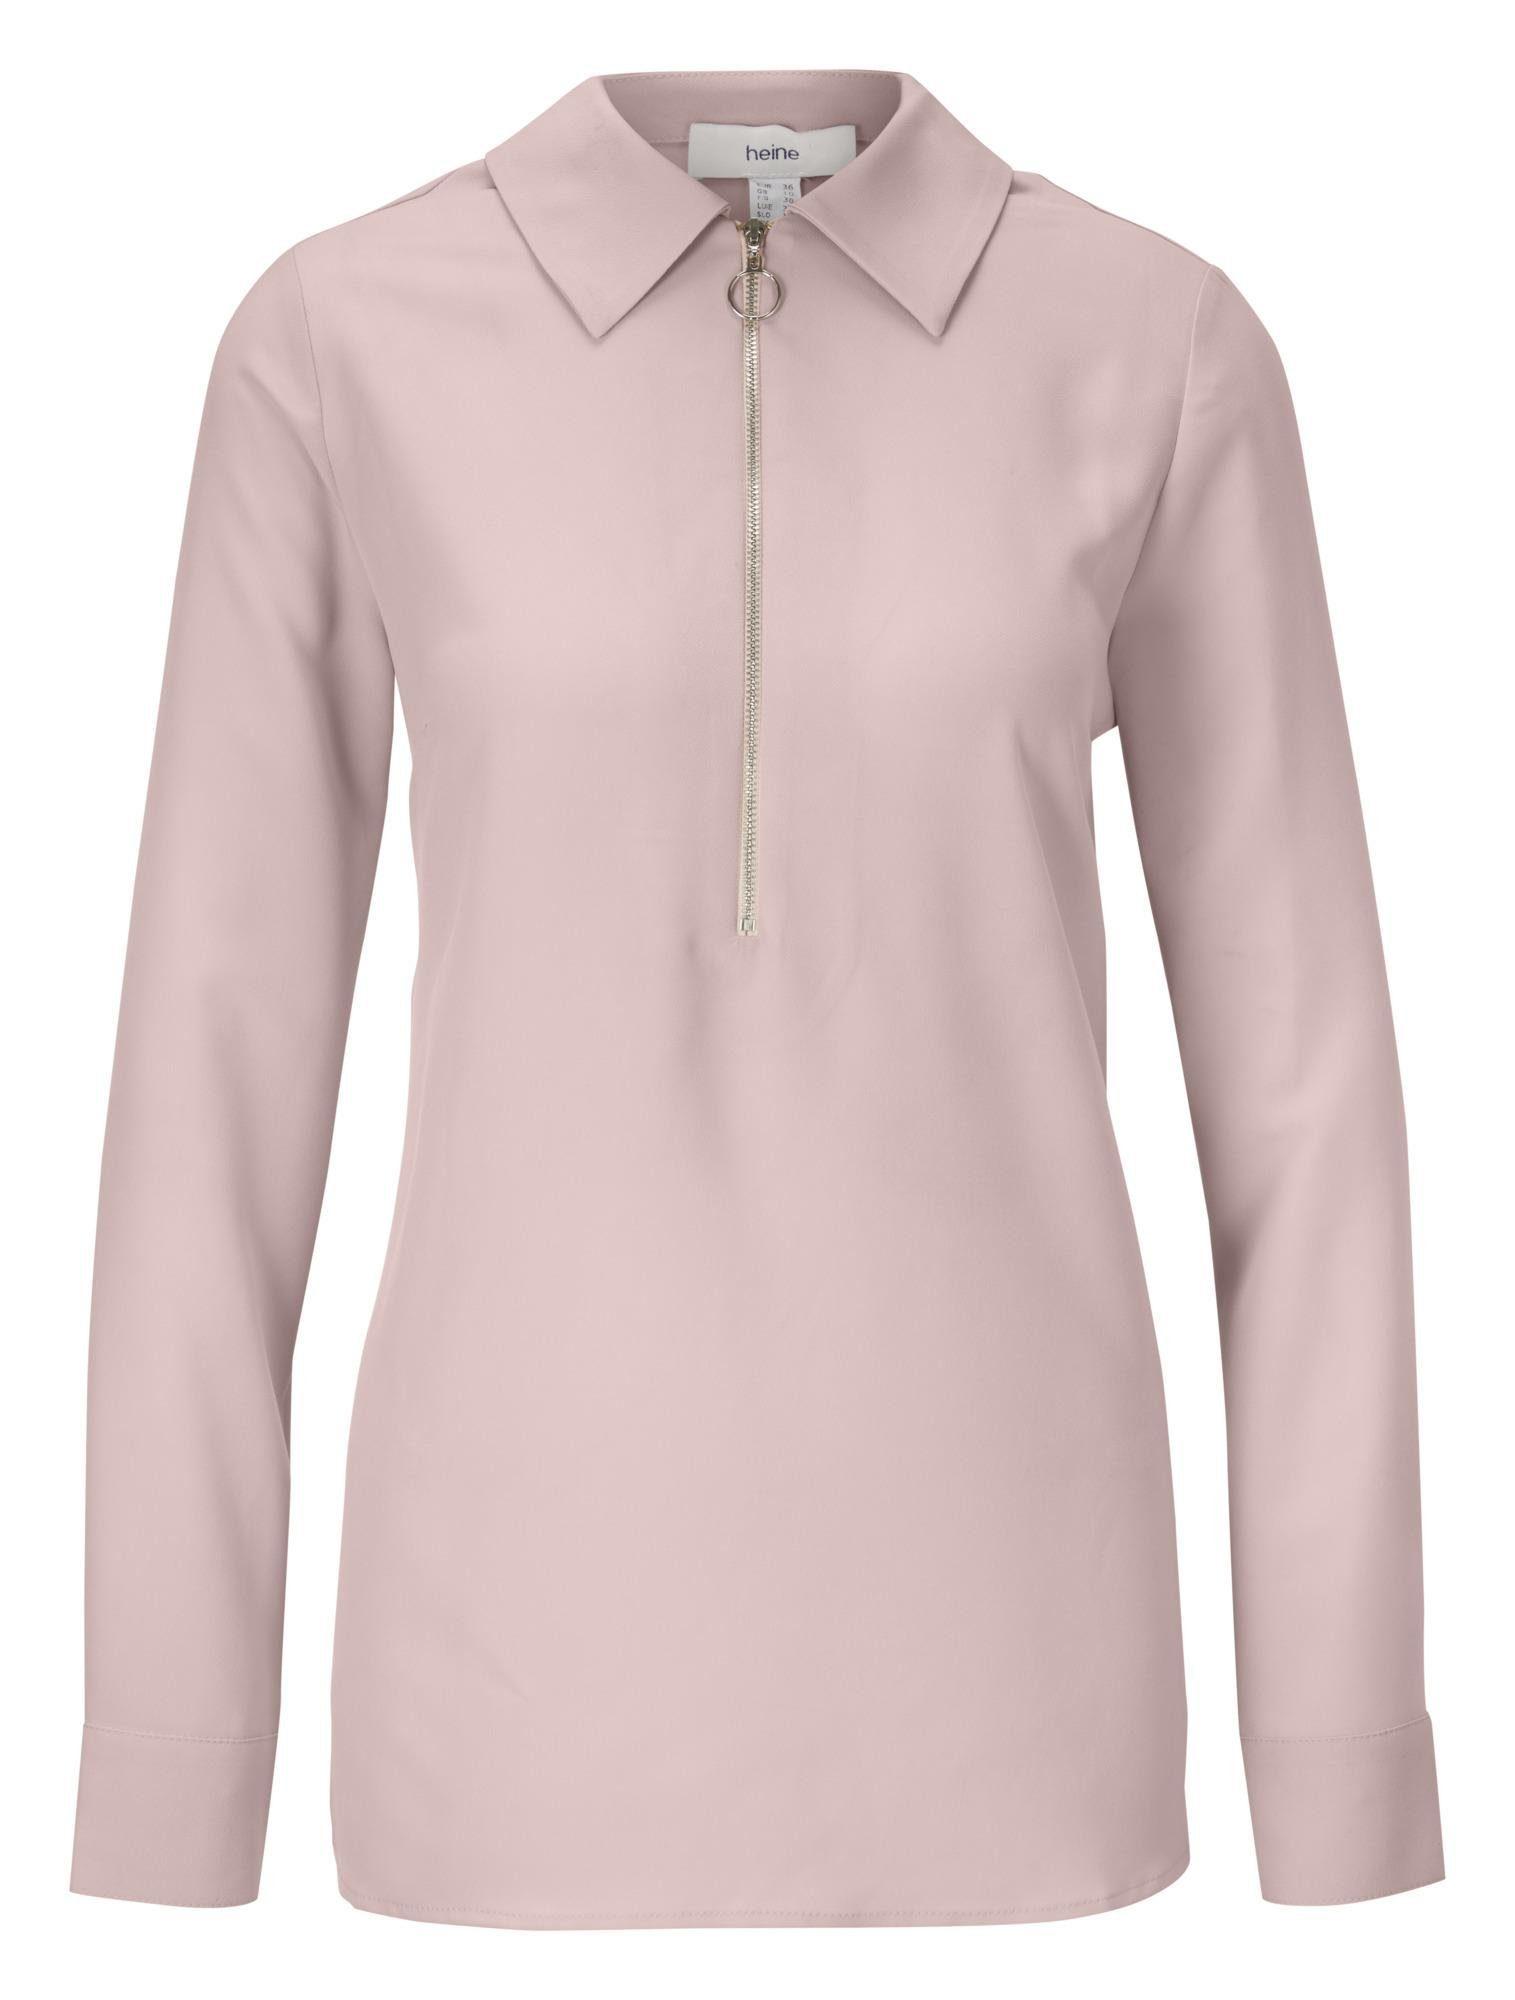 Blouse kopen? Bestel nu je blouse online | OTTO